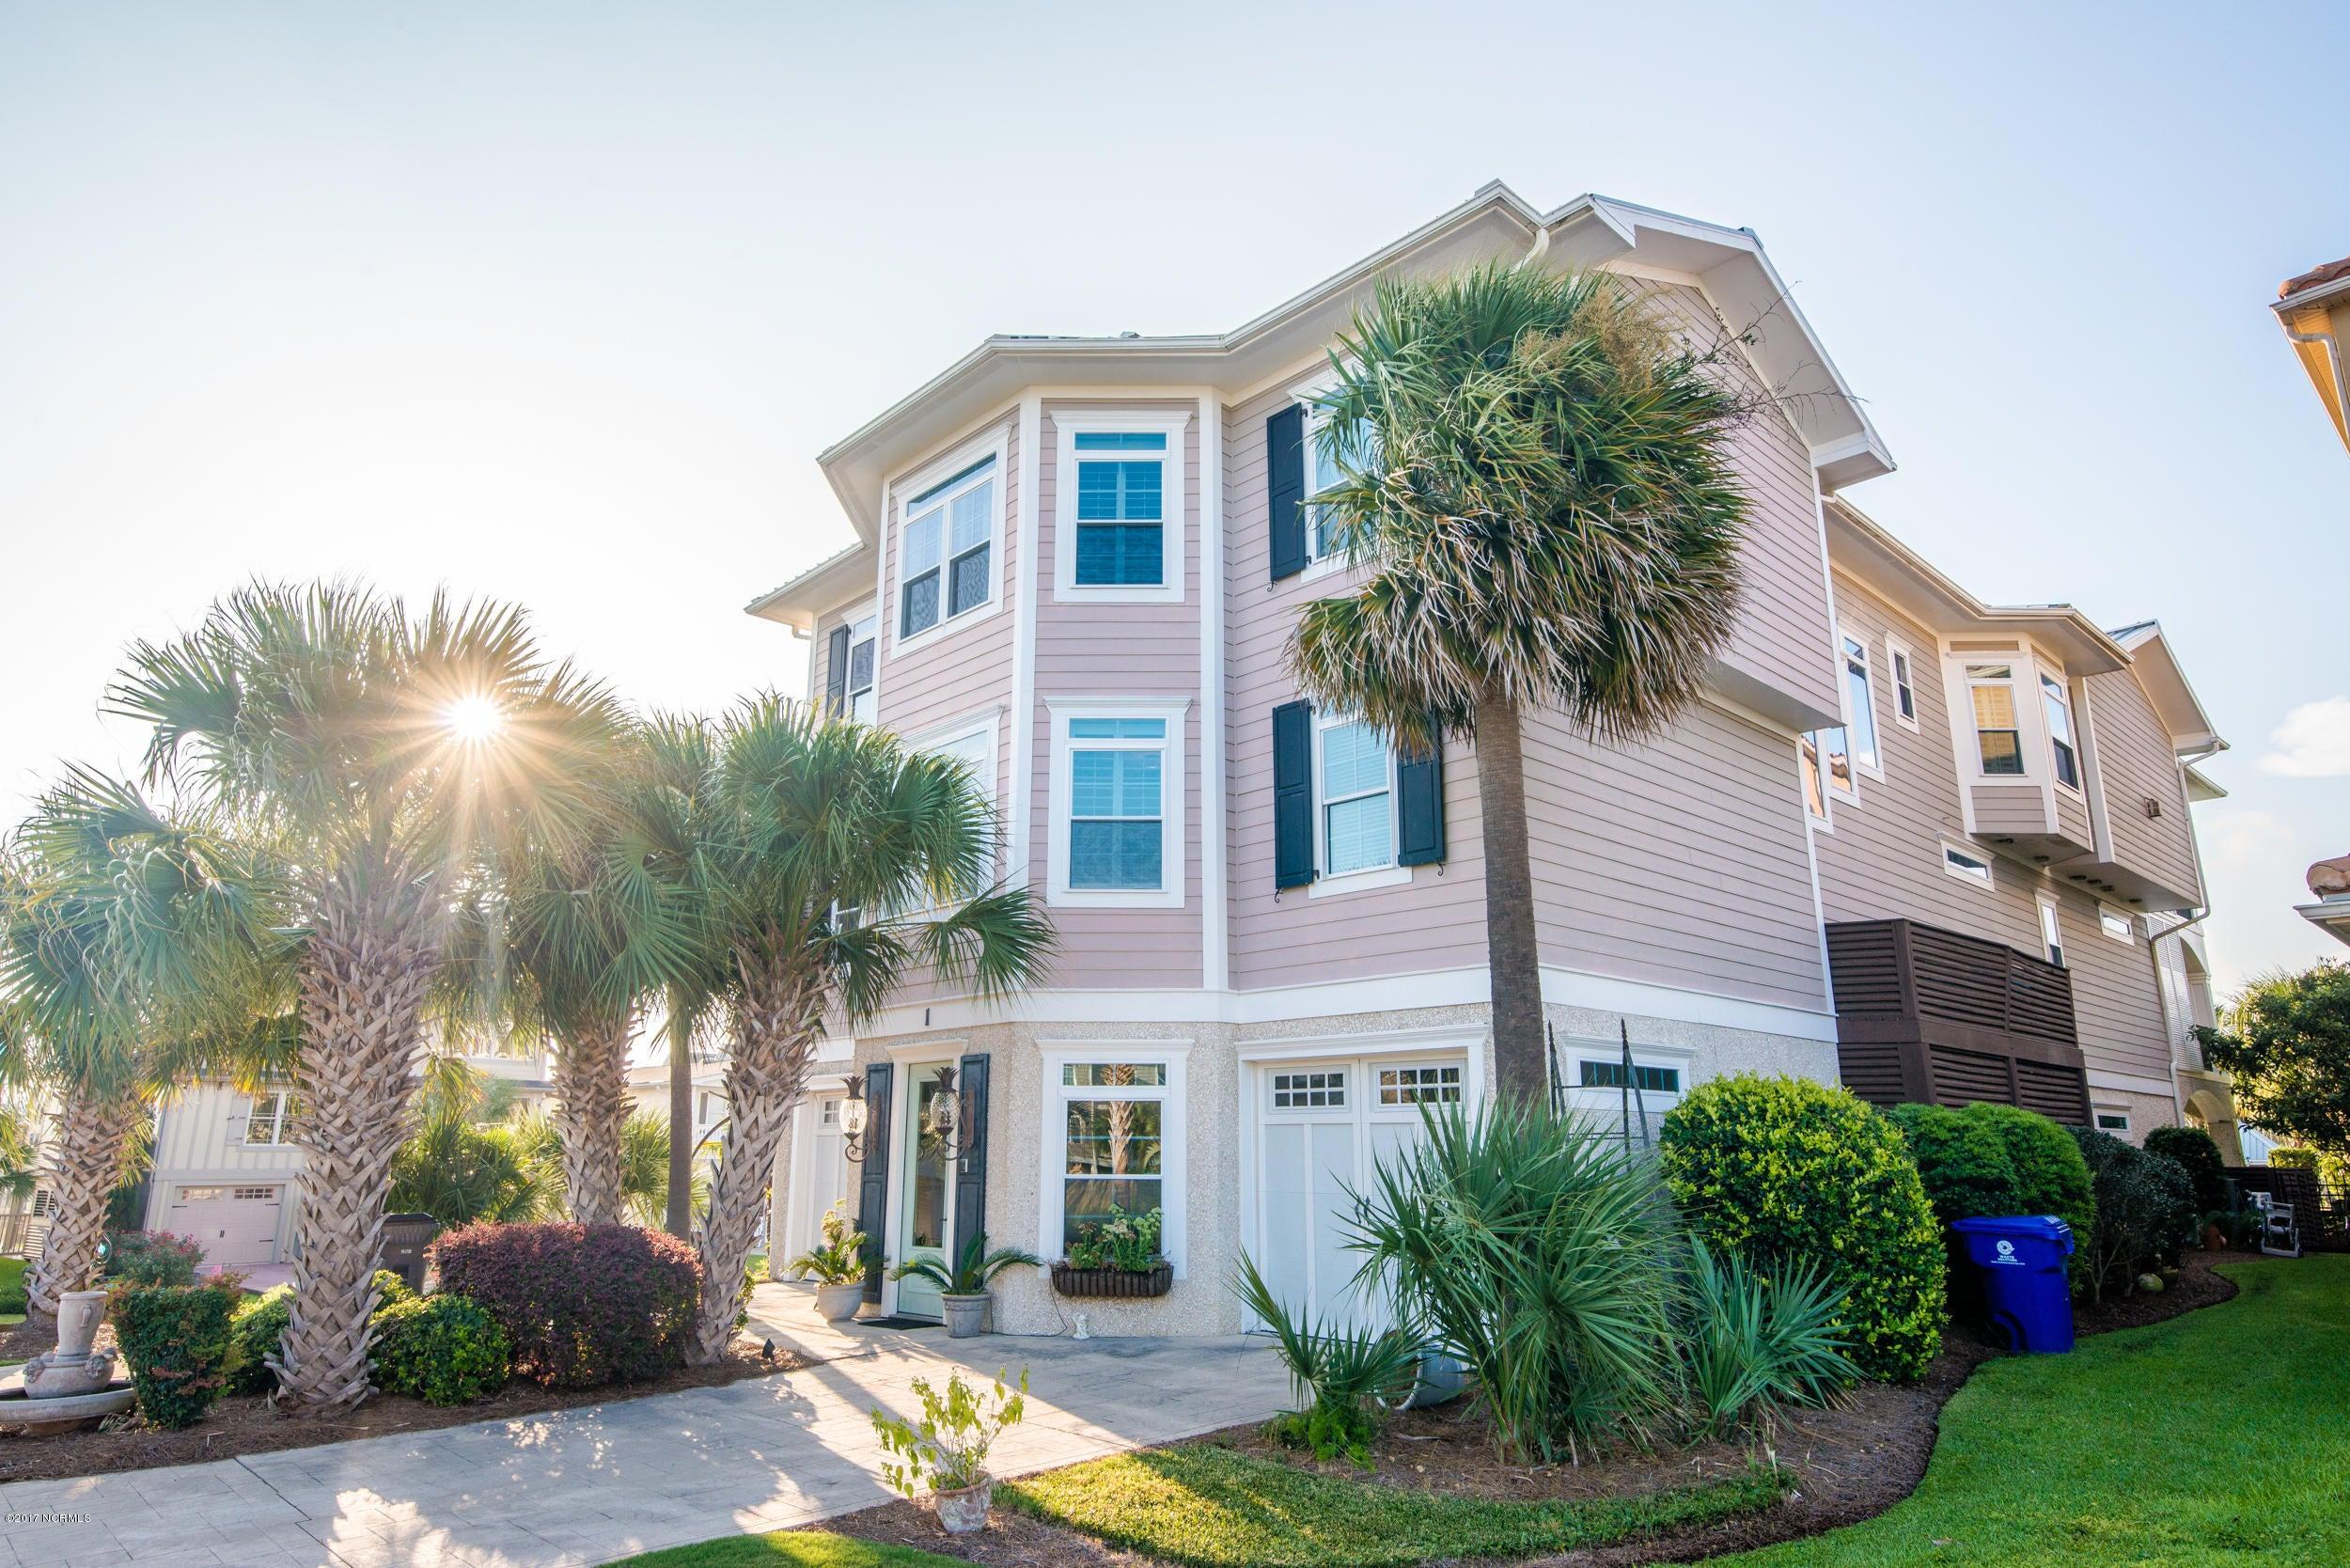 Ocean Isle Beach Real Estate - http://cdn.resize.sparkplatform.com/ncr/1024x768/true/20170829152008735120000000-o.jpg